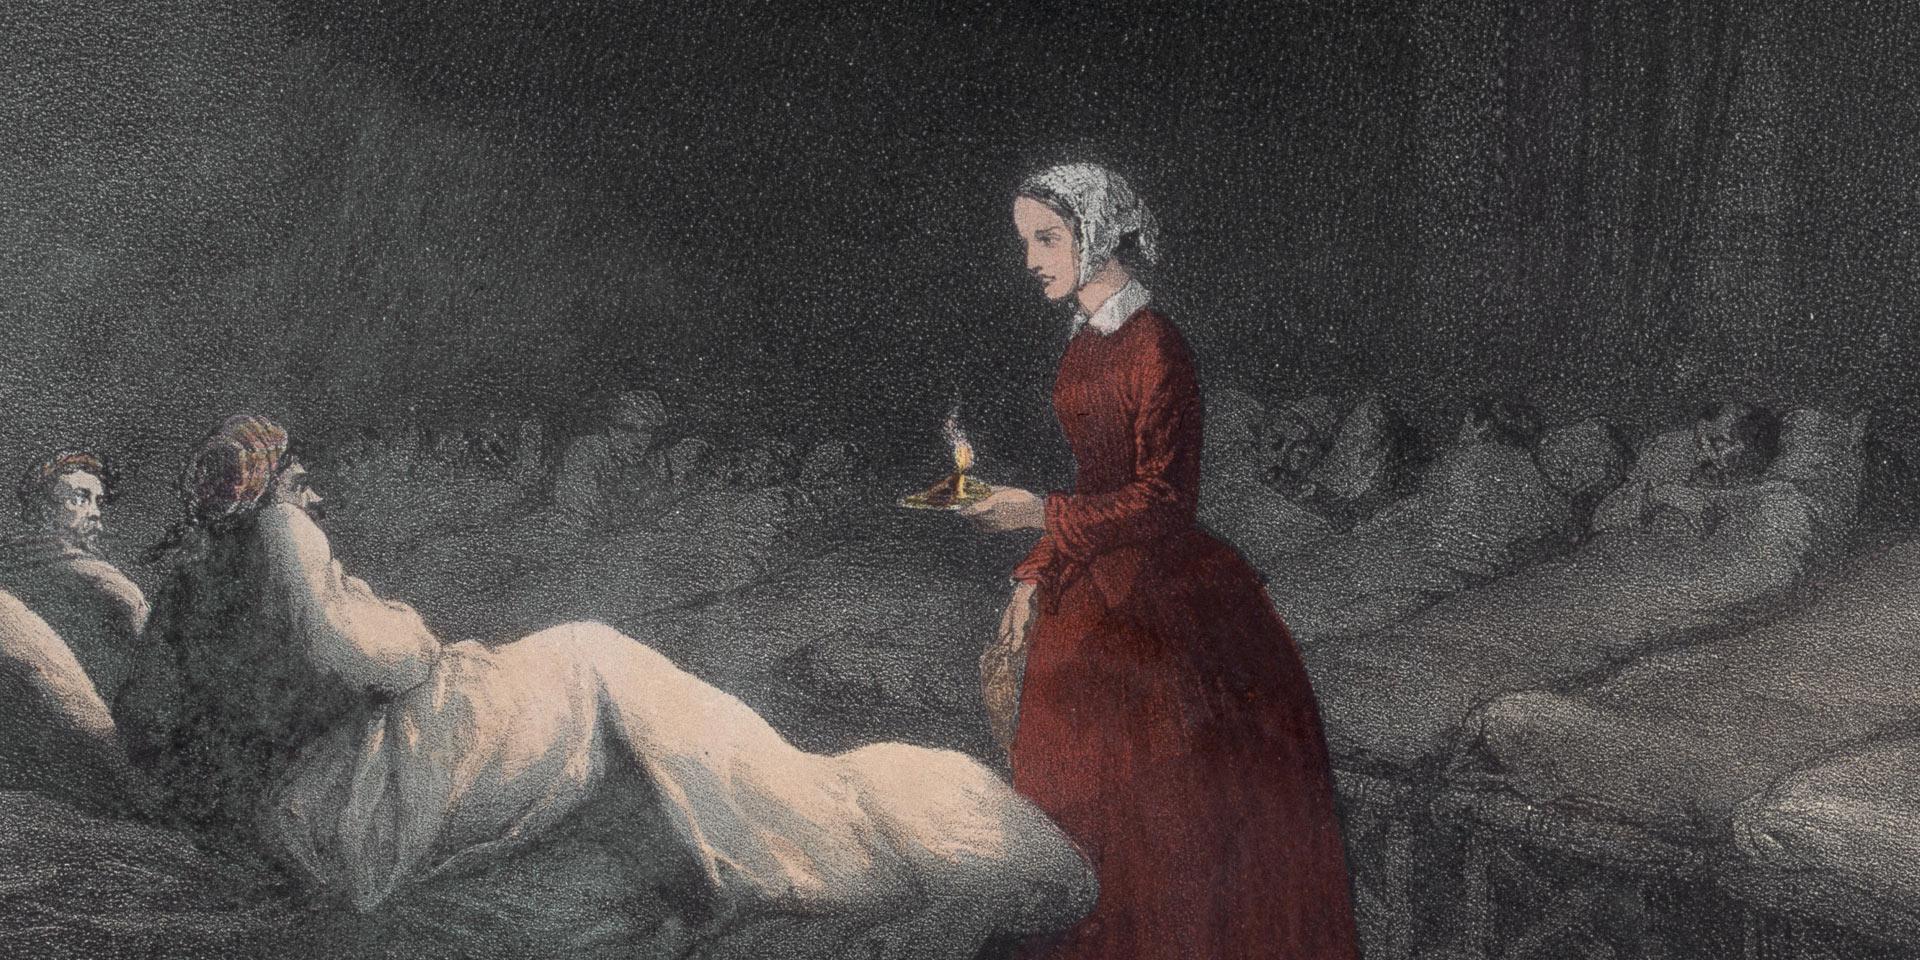 Florence Nightingale at Scutari, 1856